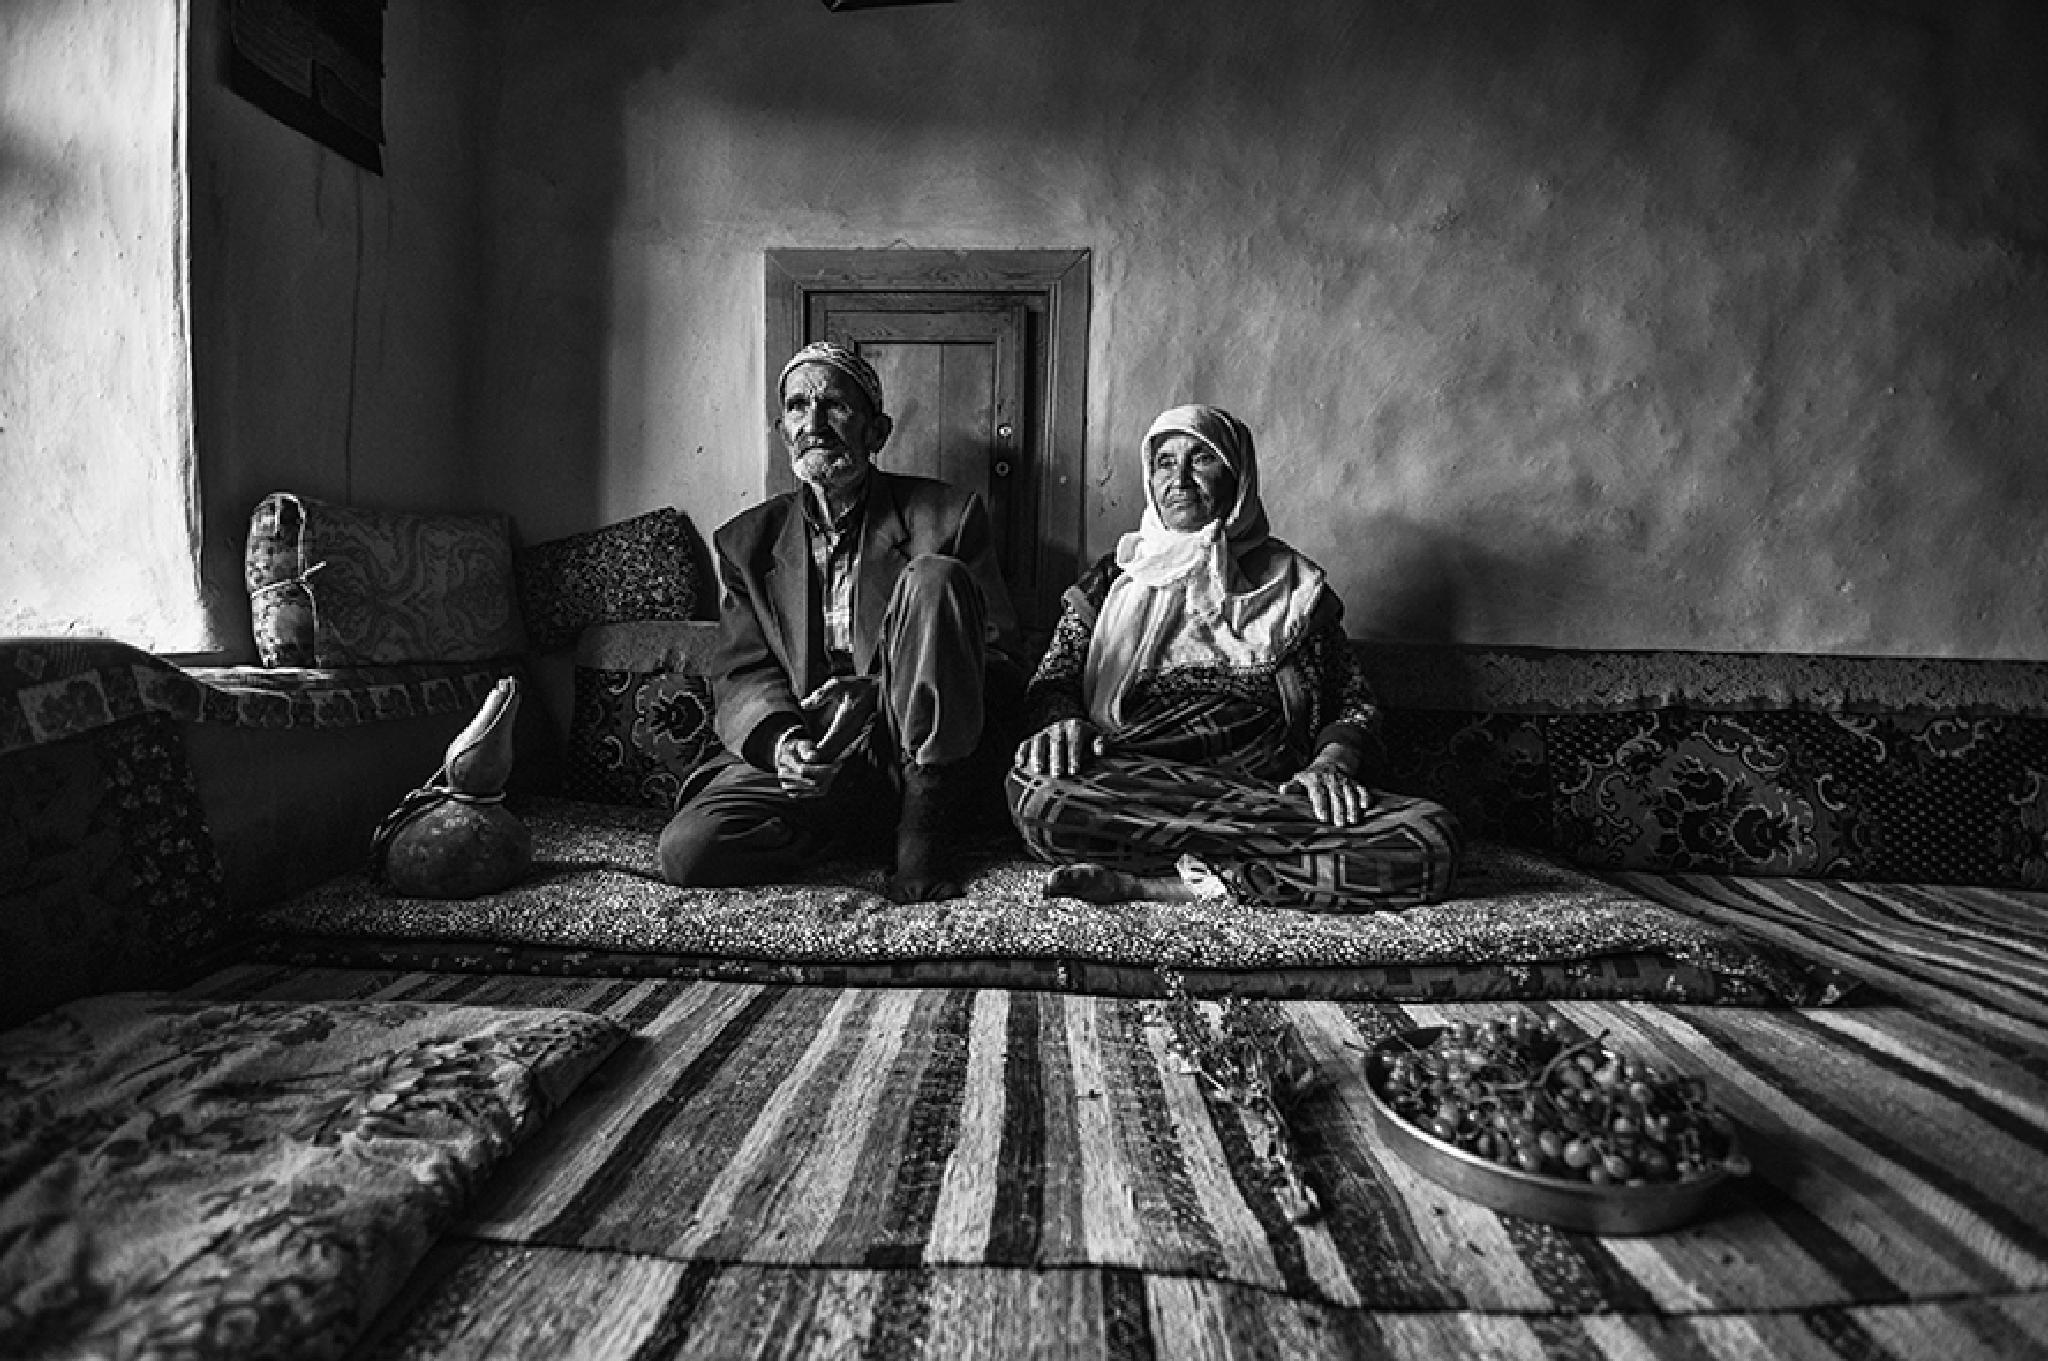 Two by Mustafa Doğan